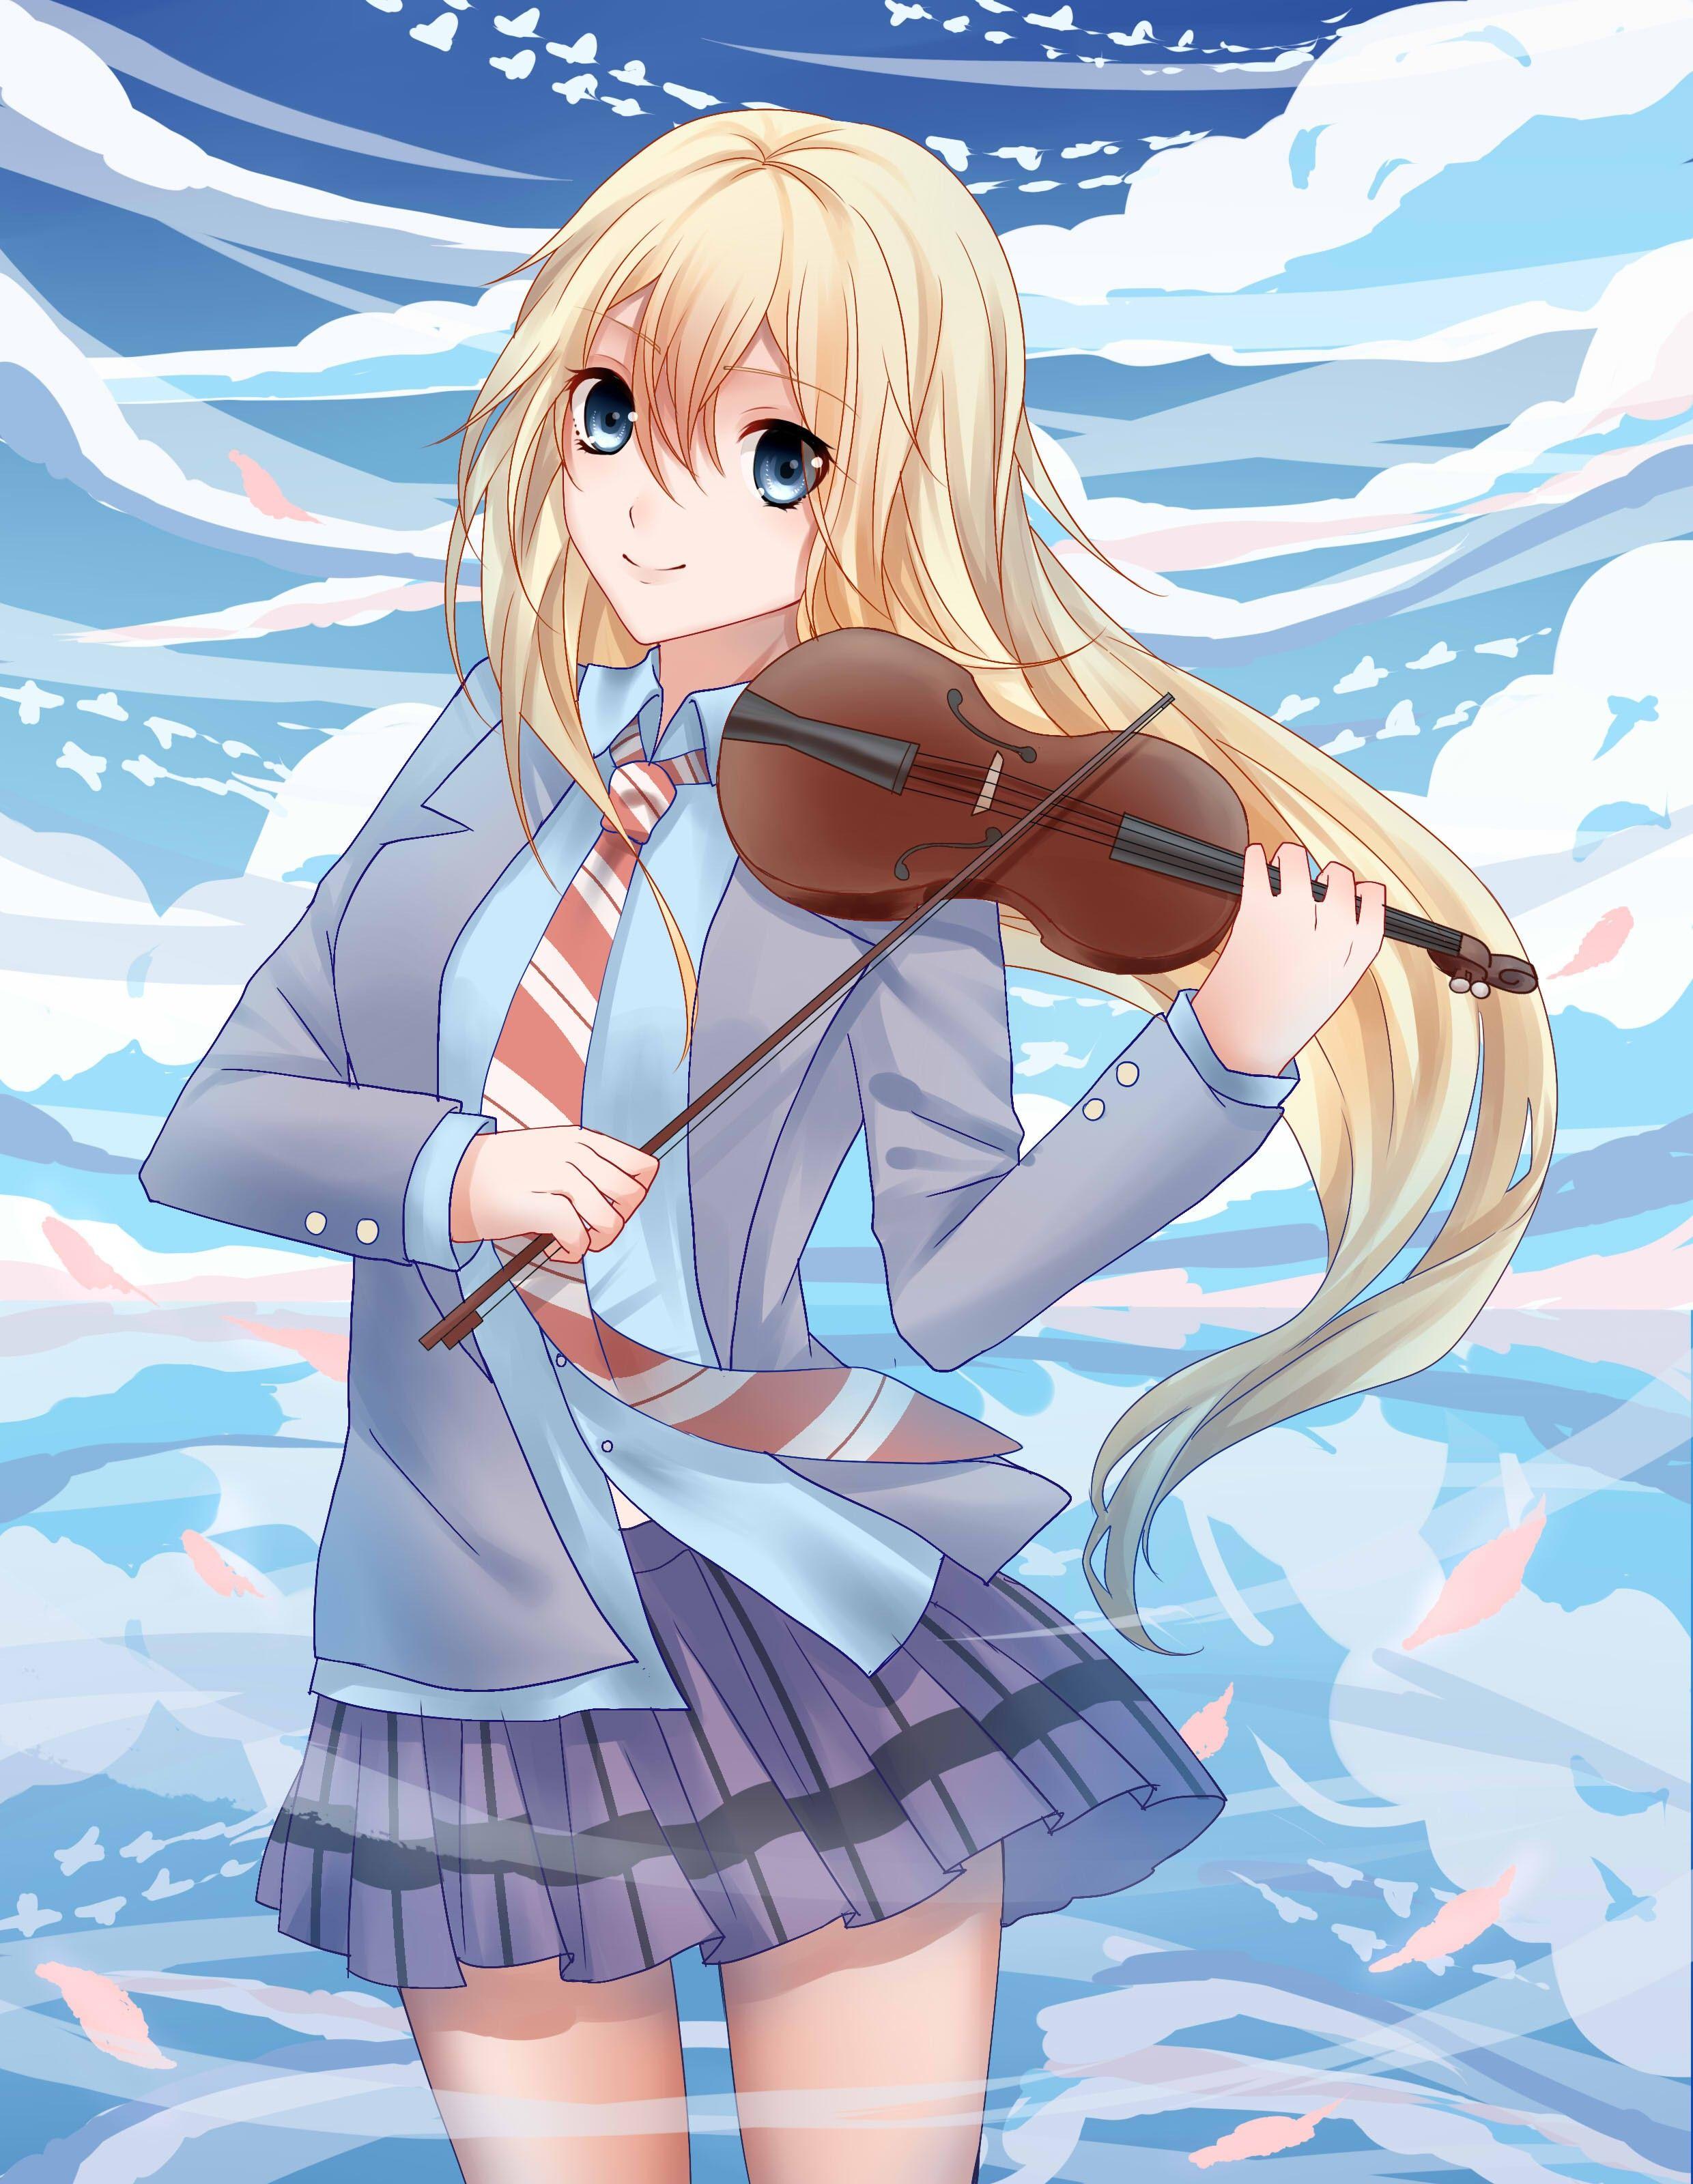 Anime 2480x3200 anime anime girls long hair blonde blue